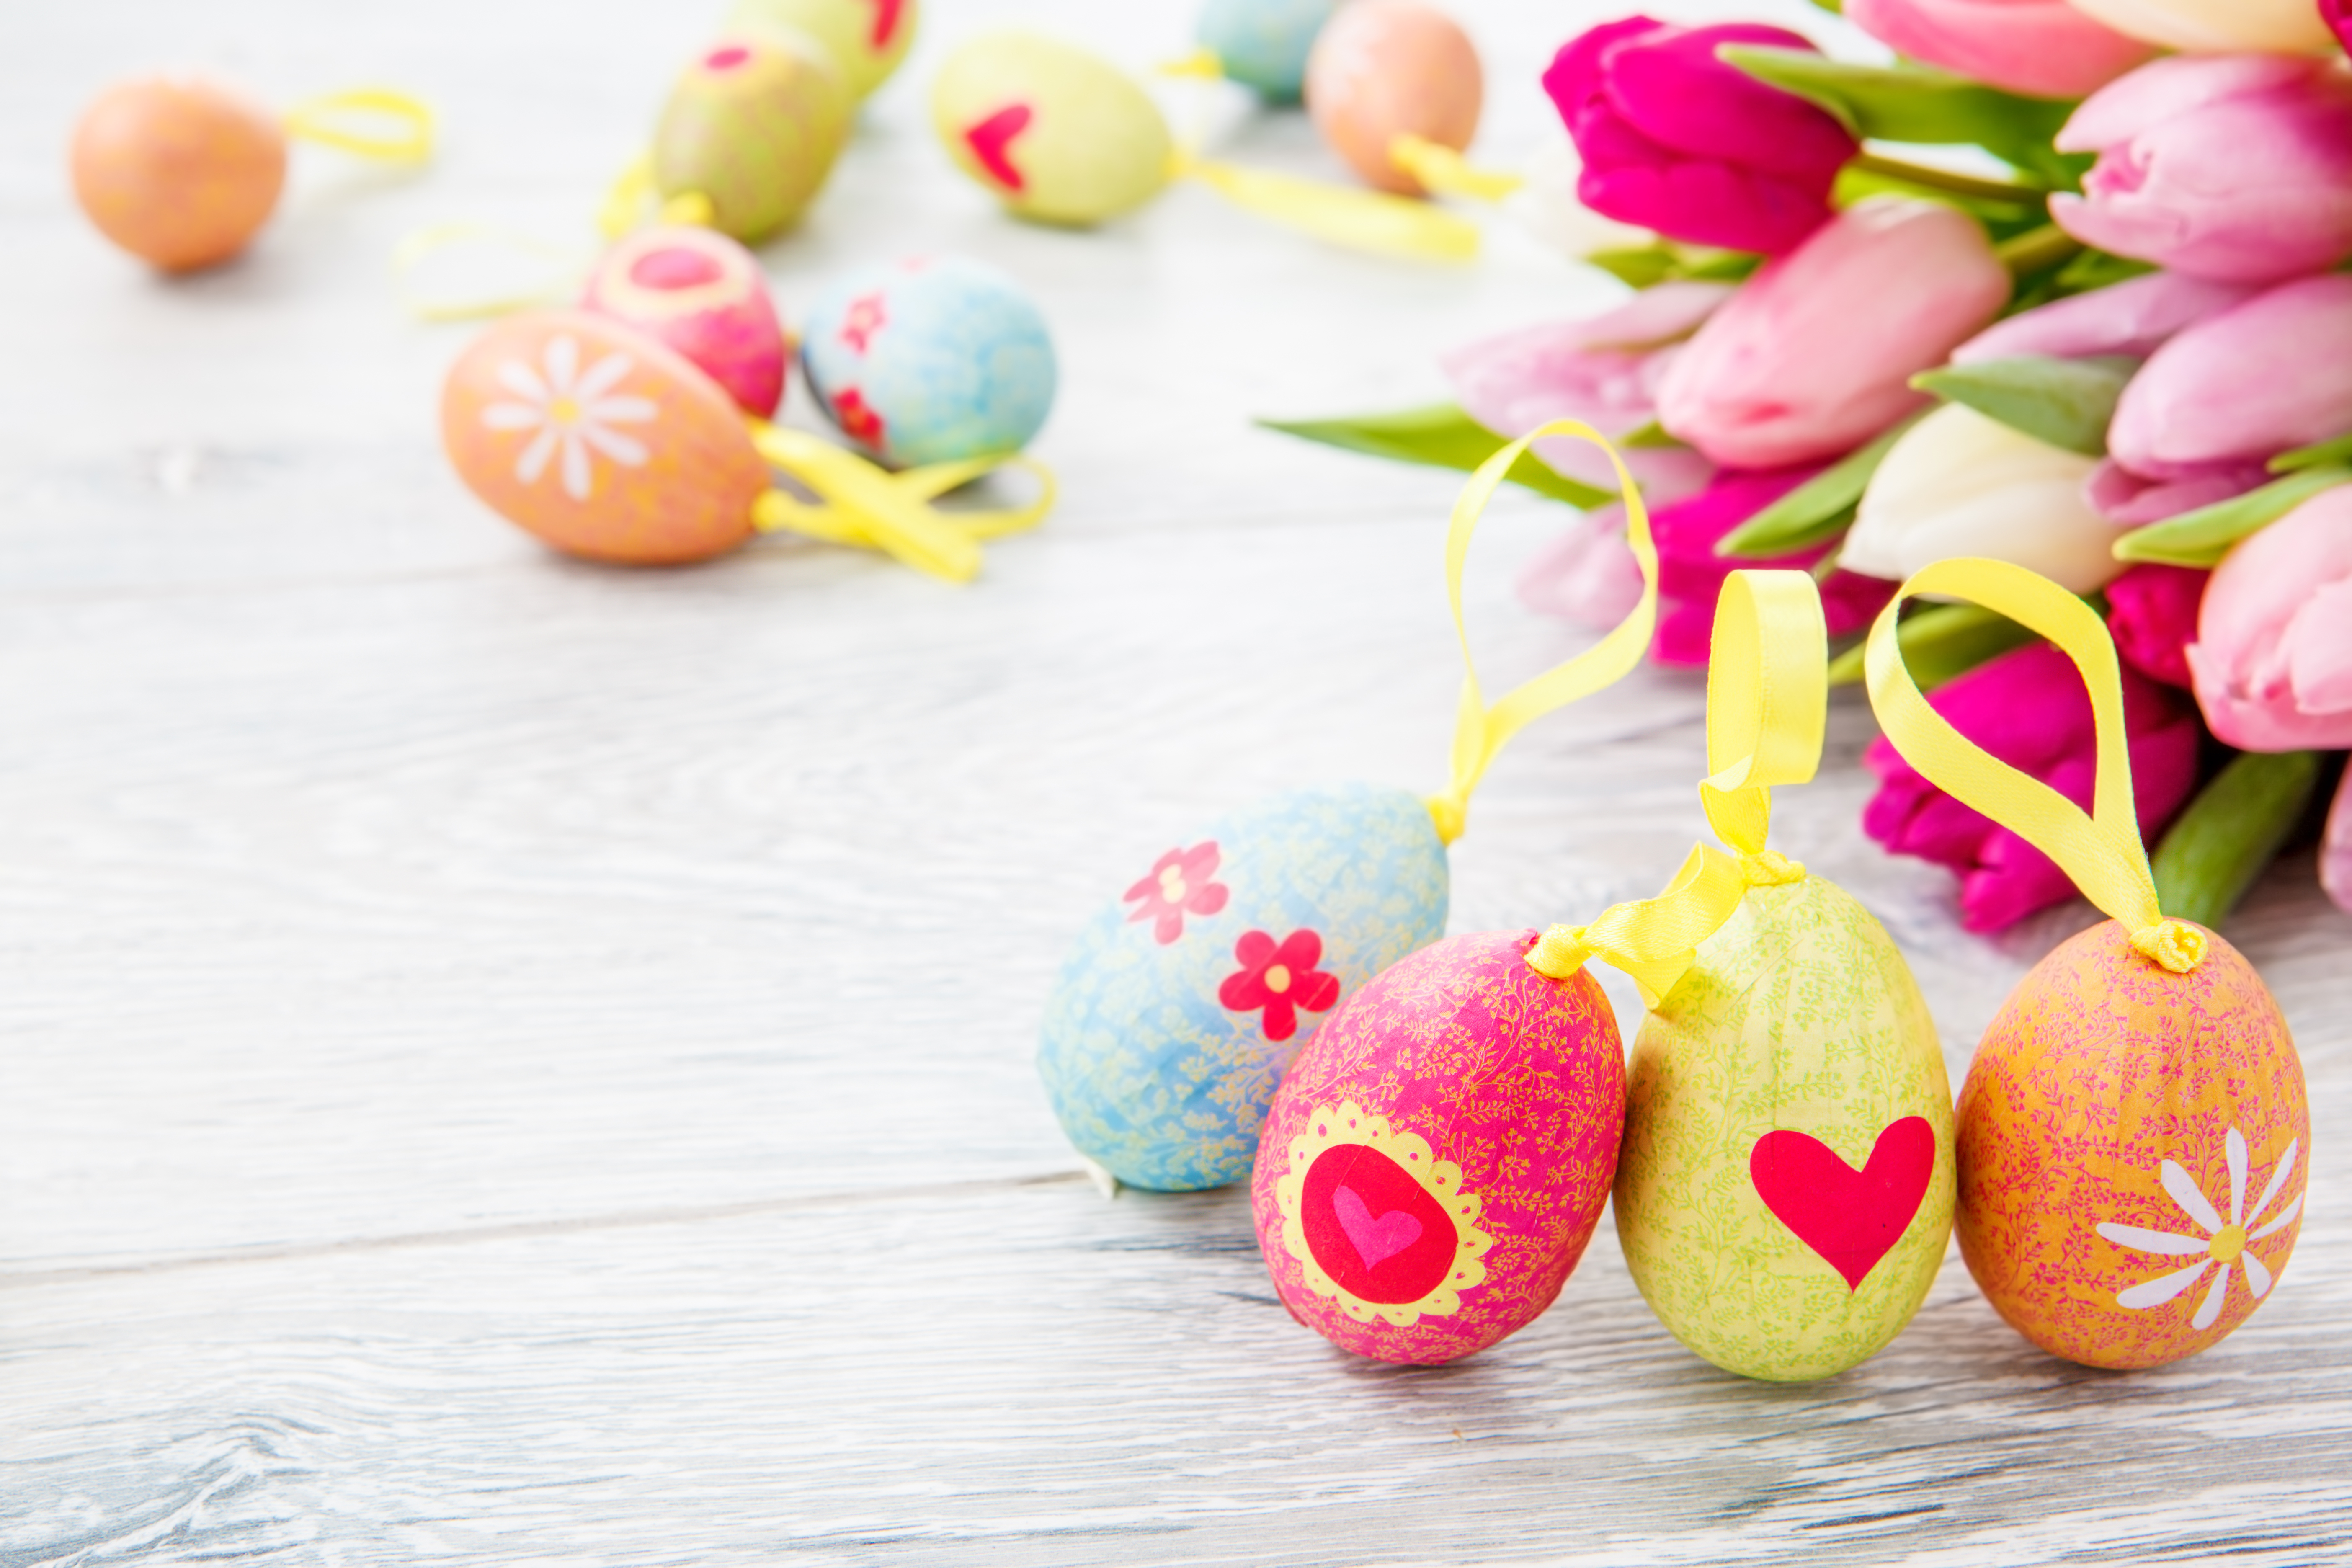 яйца пасха eggs Easter загрузить